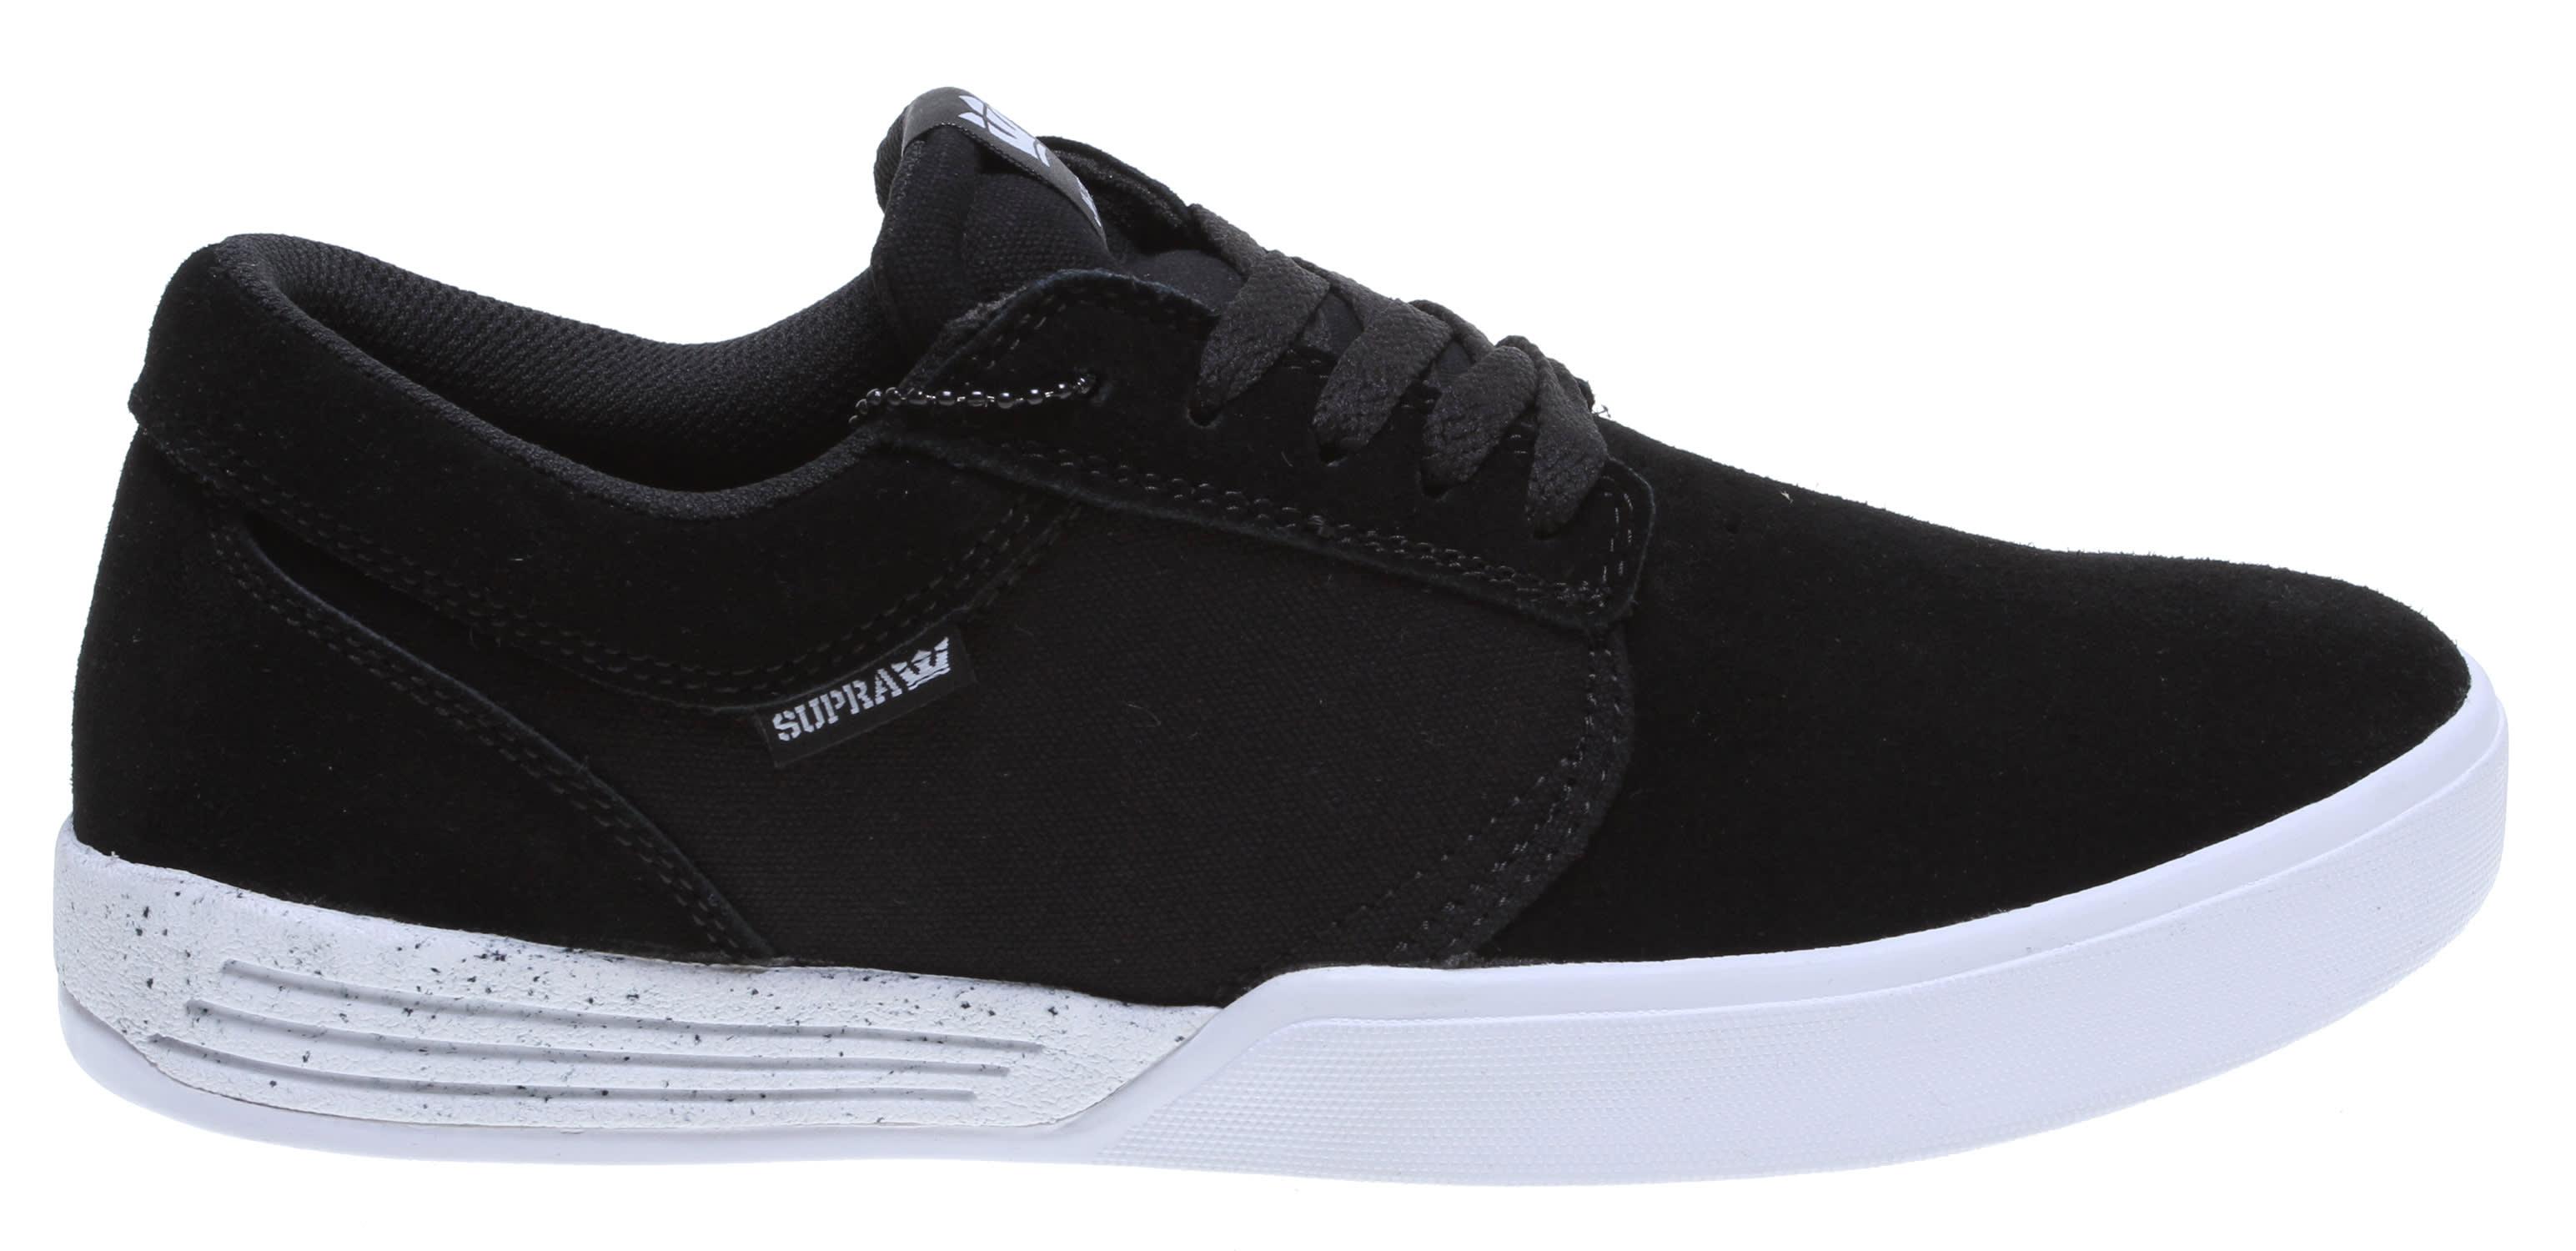 b5681af5cb92 Supra Hammer Skate Shoes - thumbnail 1